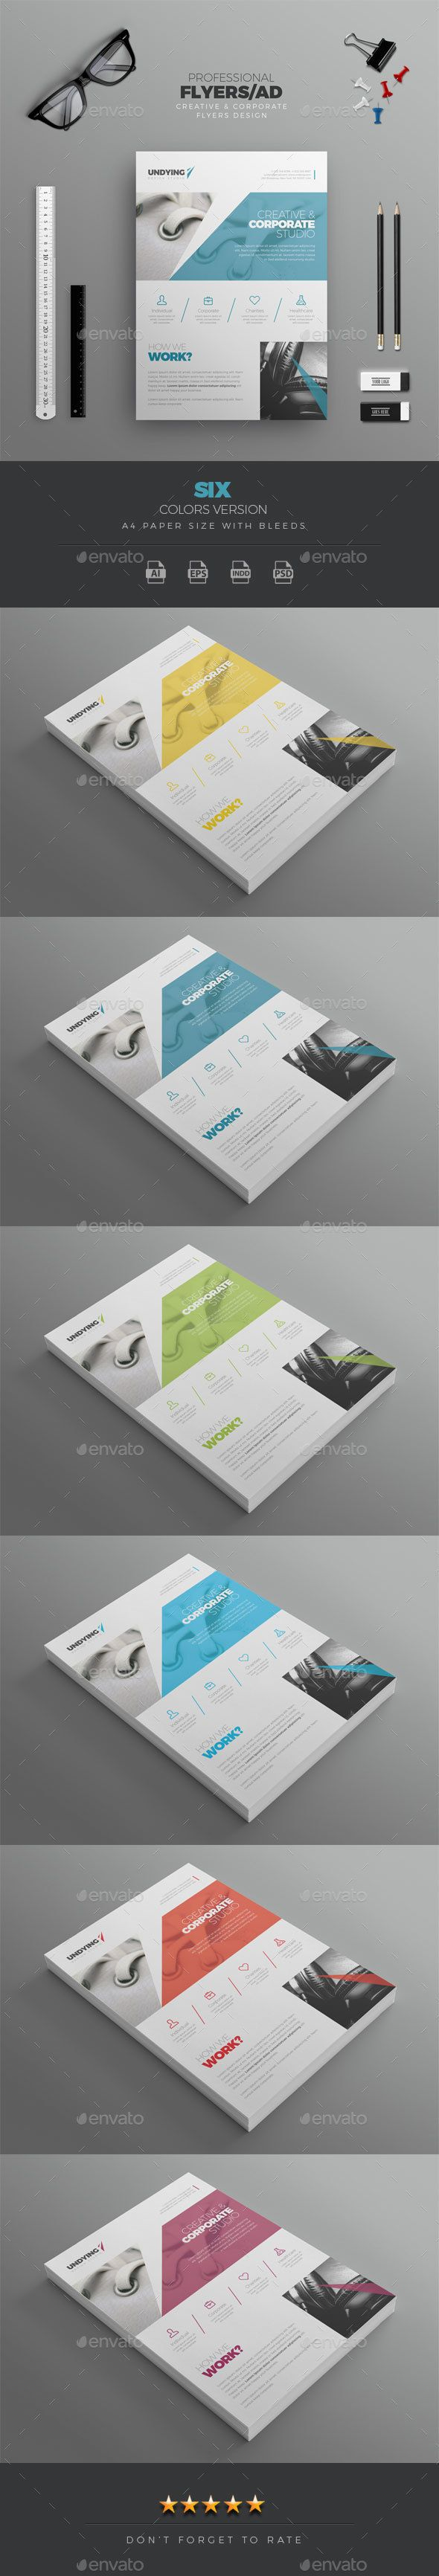 488 best design coporat images on pinterest